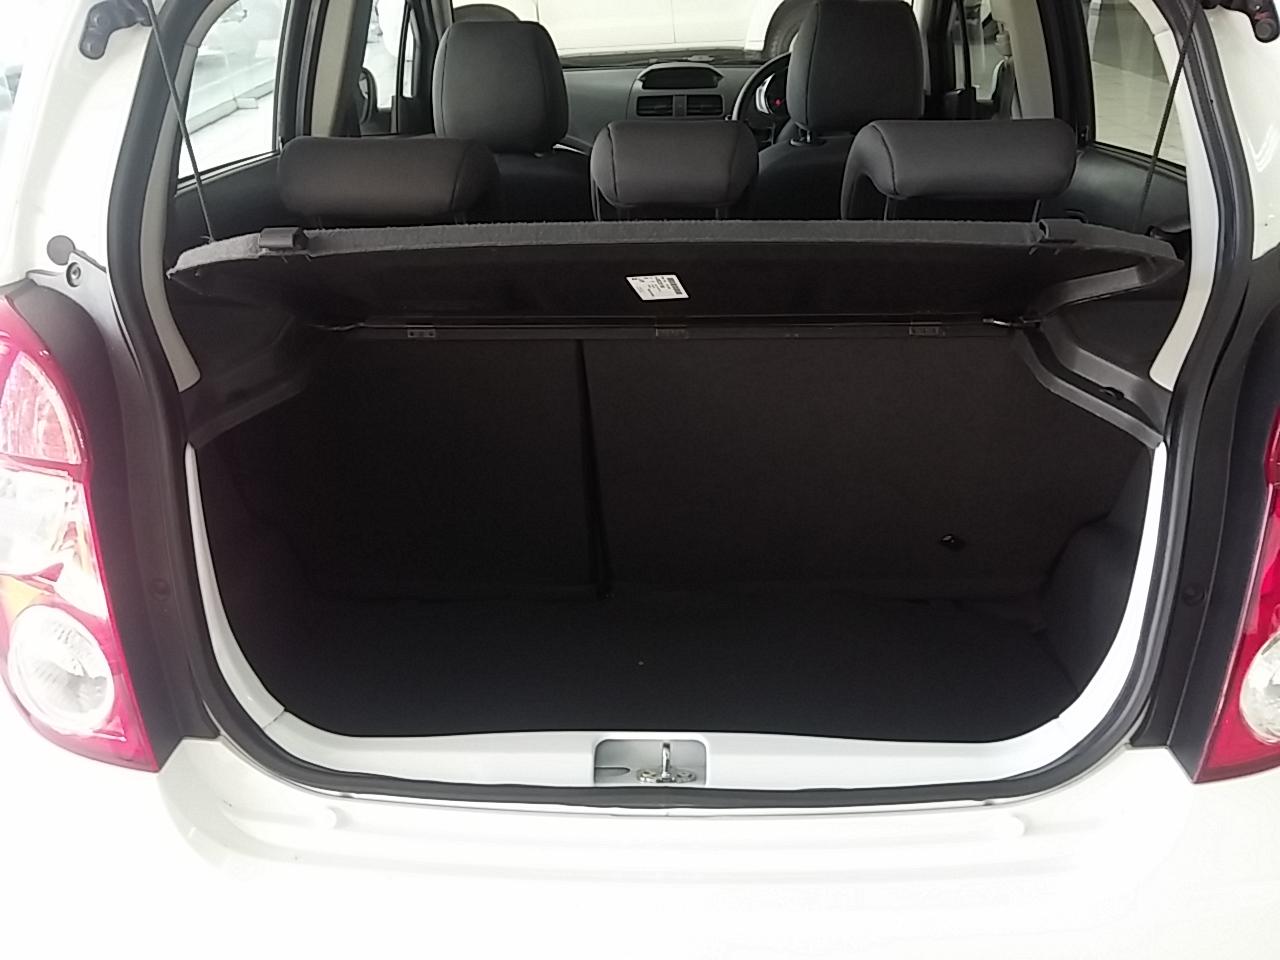 Chevrolet Spark 1.2 Ls 5dr